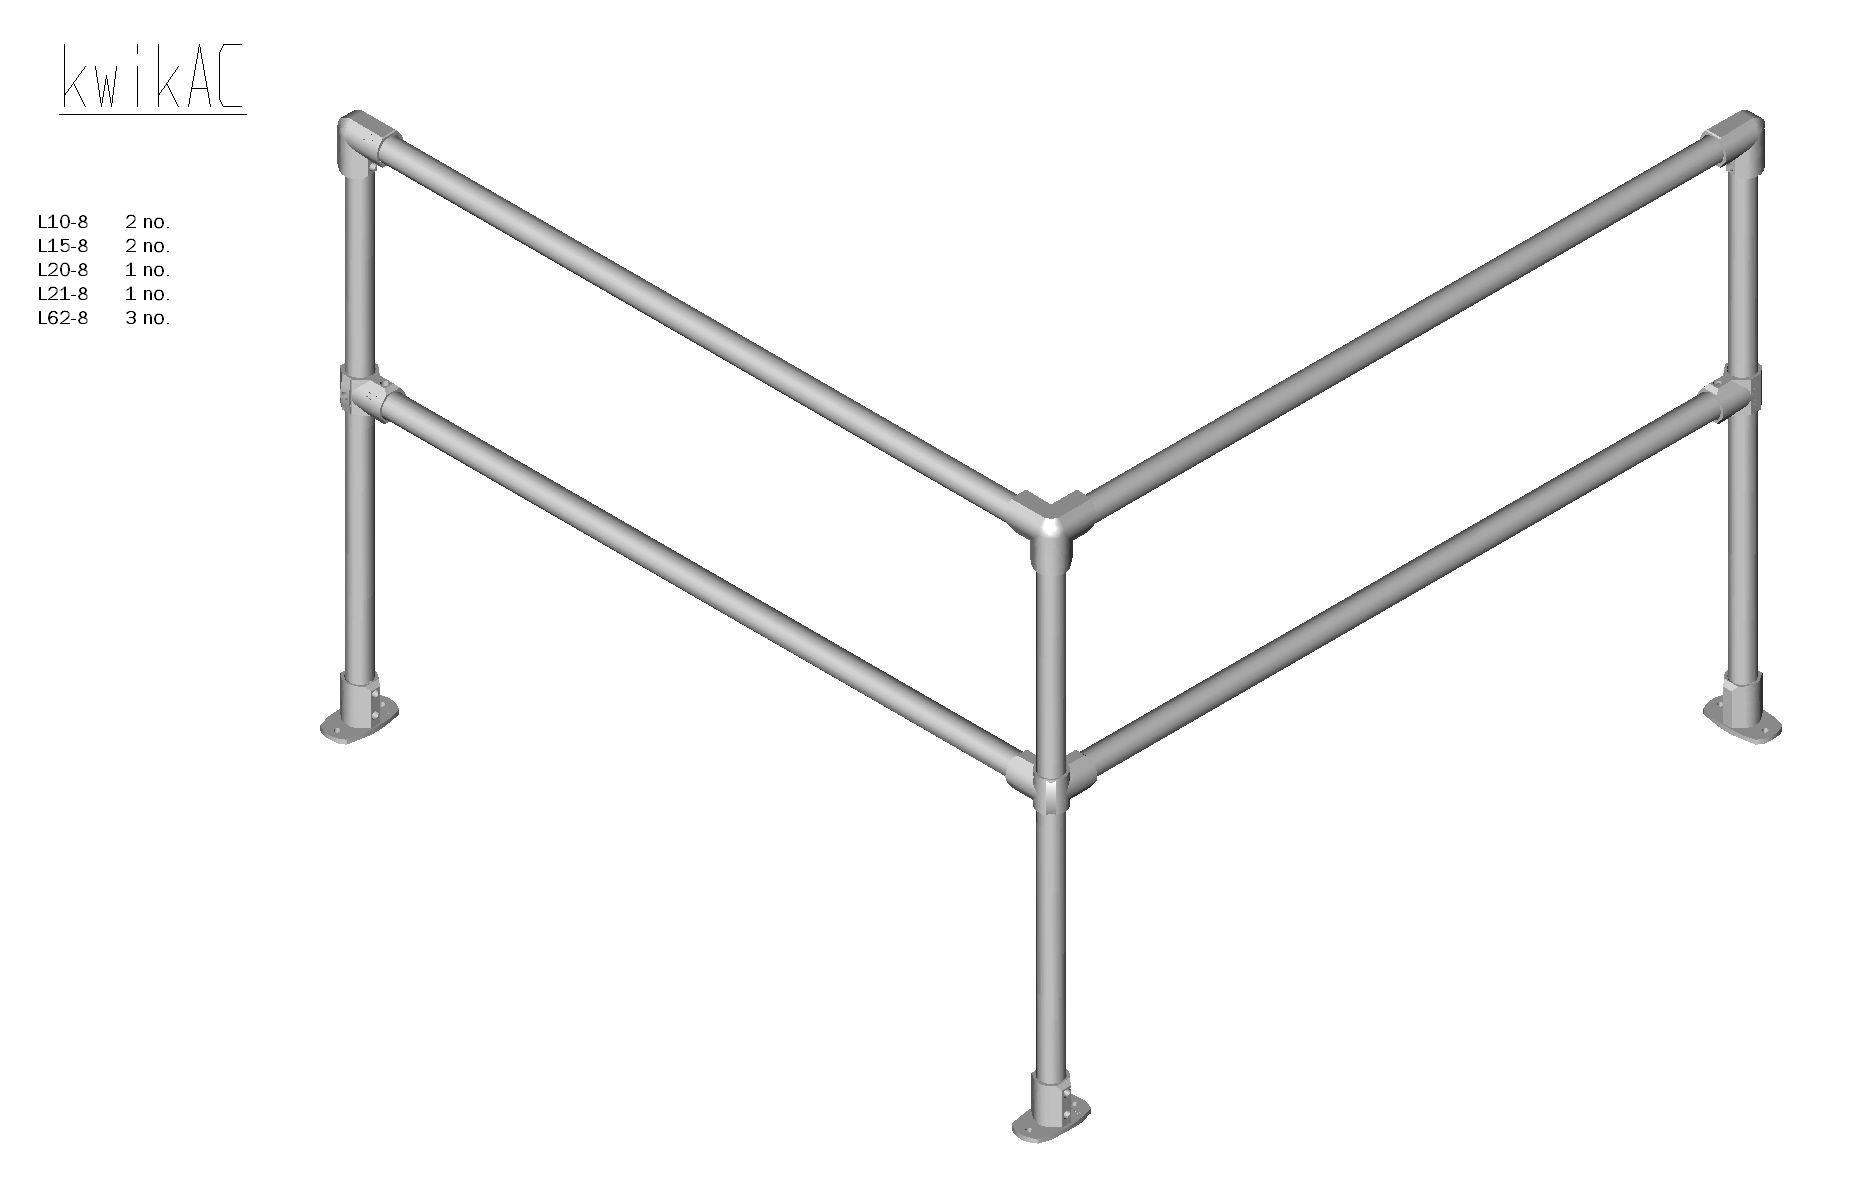 Kwik Kit Aluminium Corner Kit